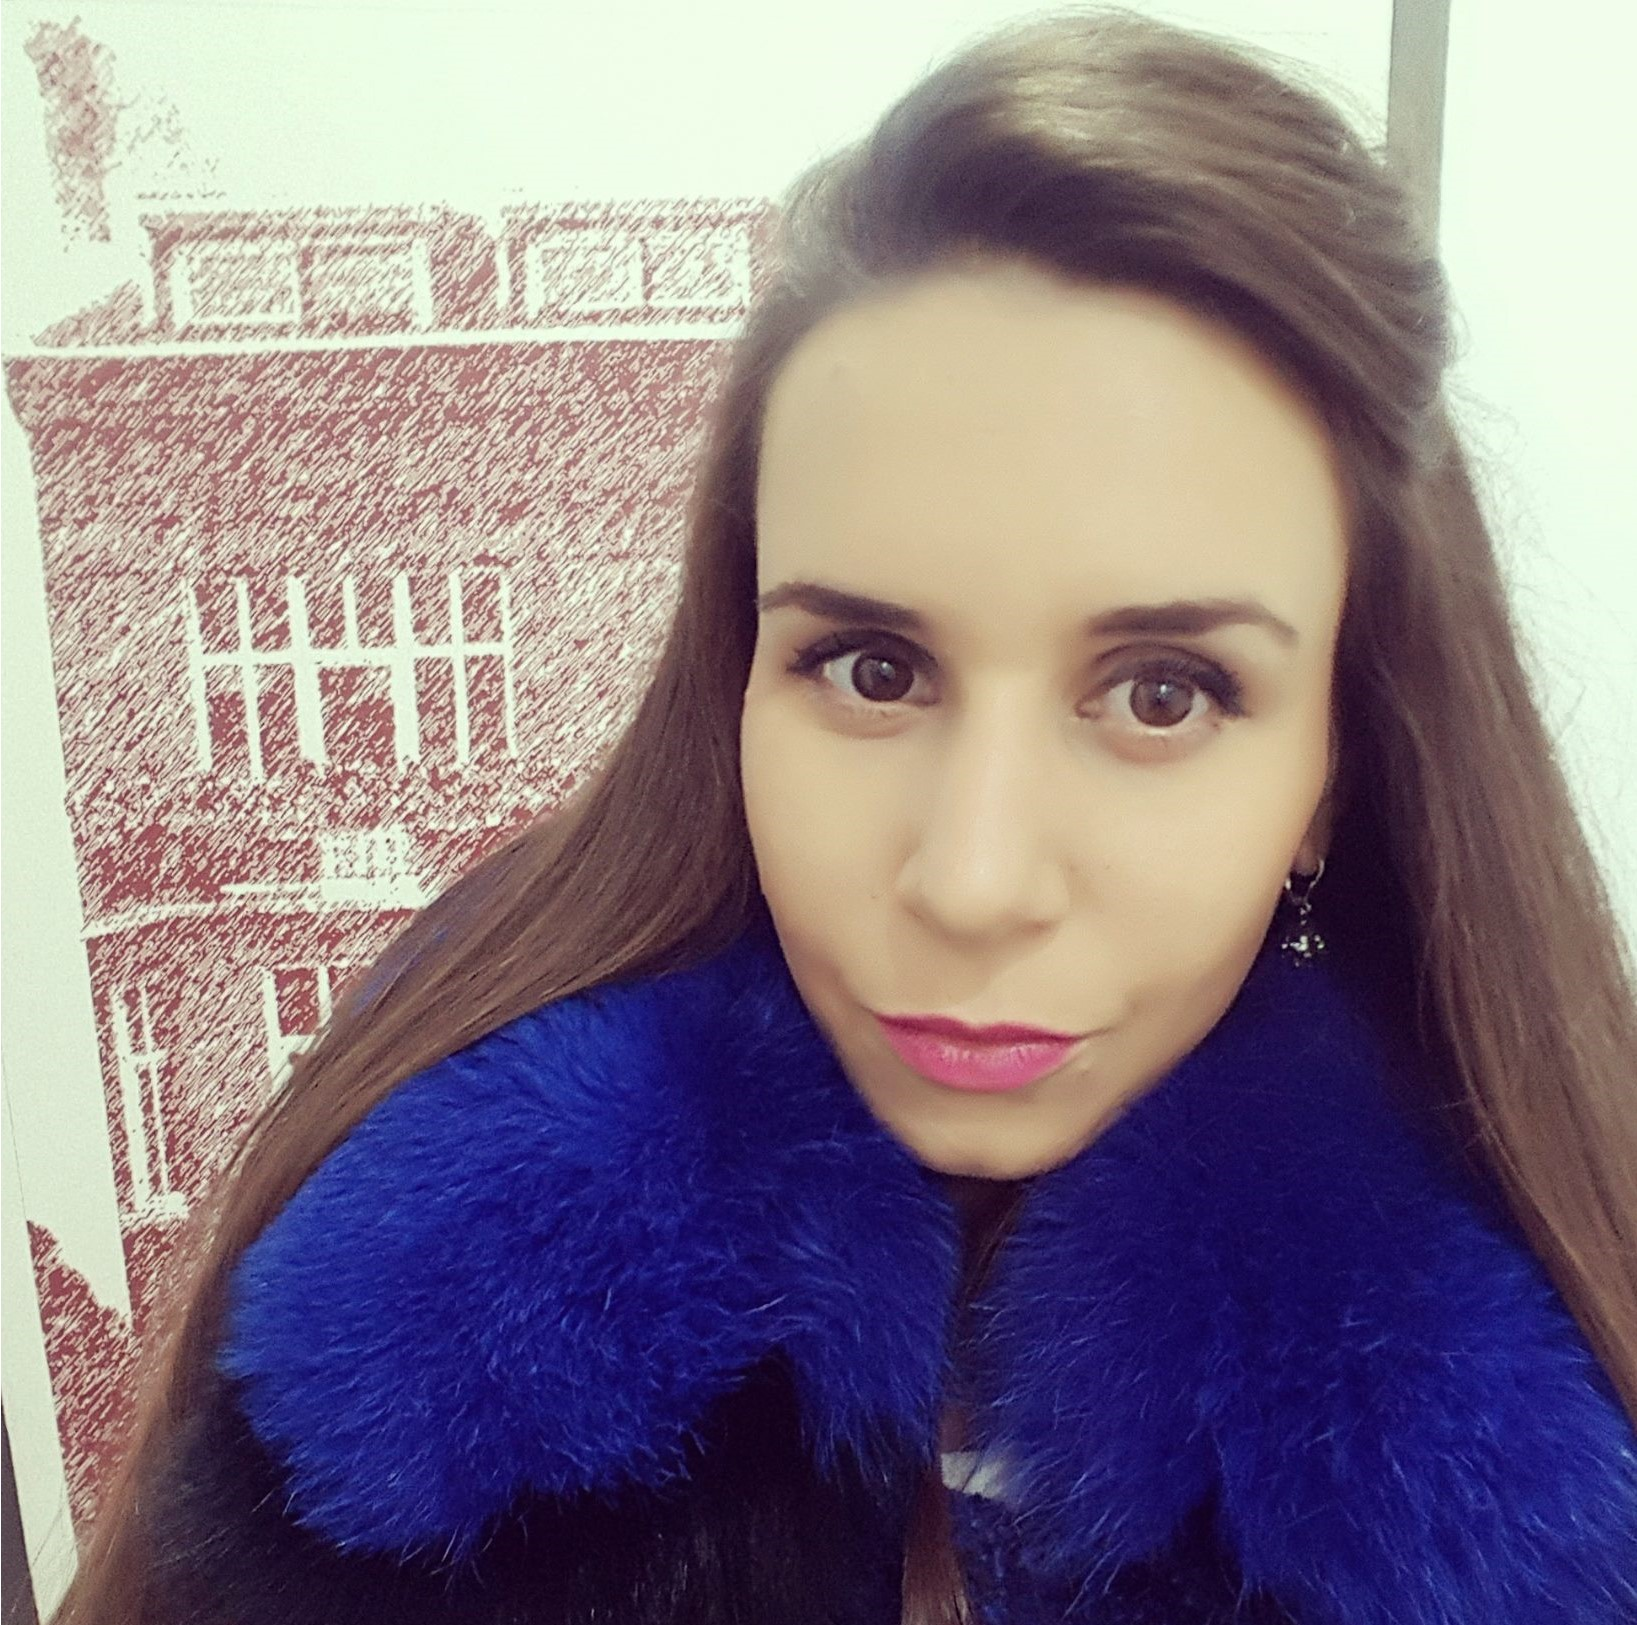 Vasilena Apostolova